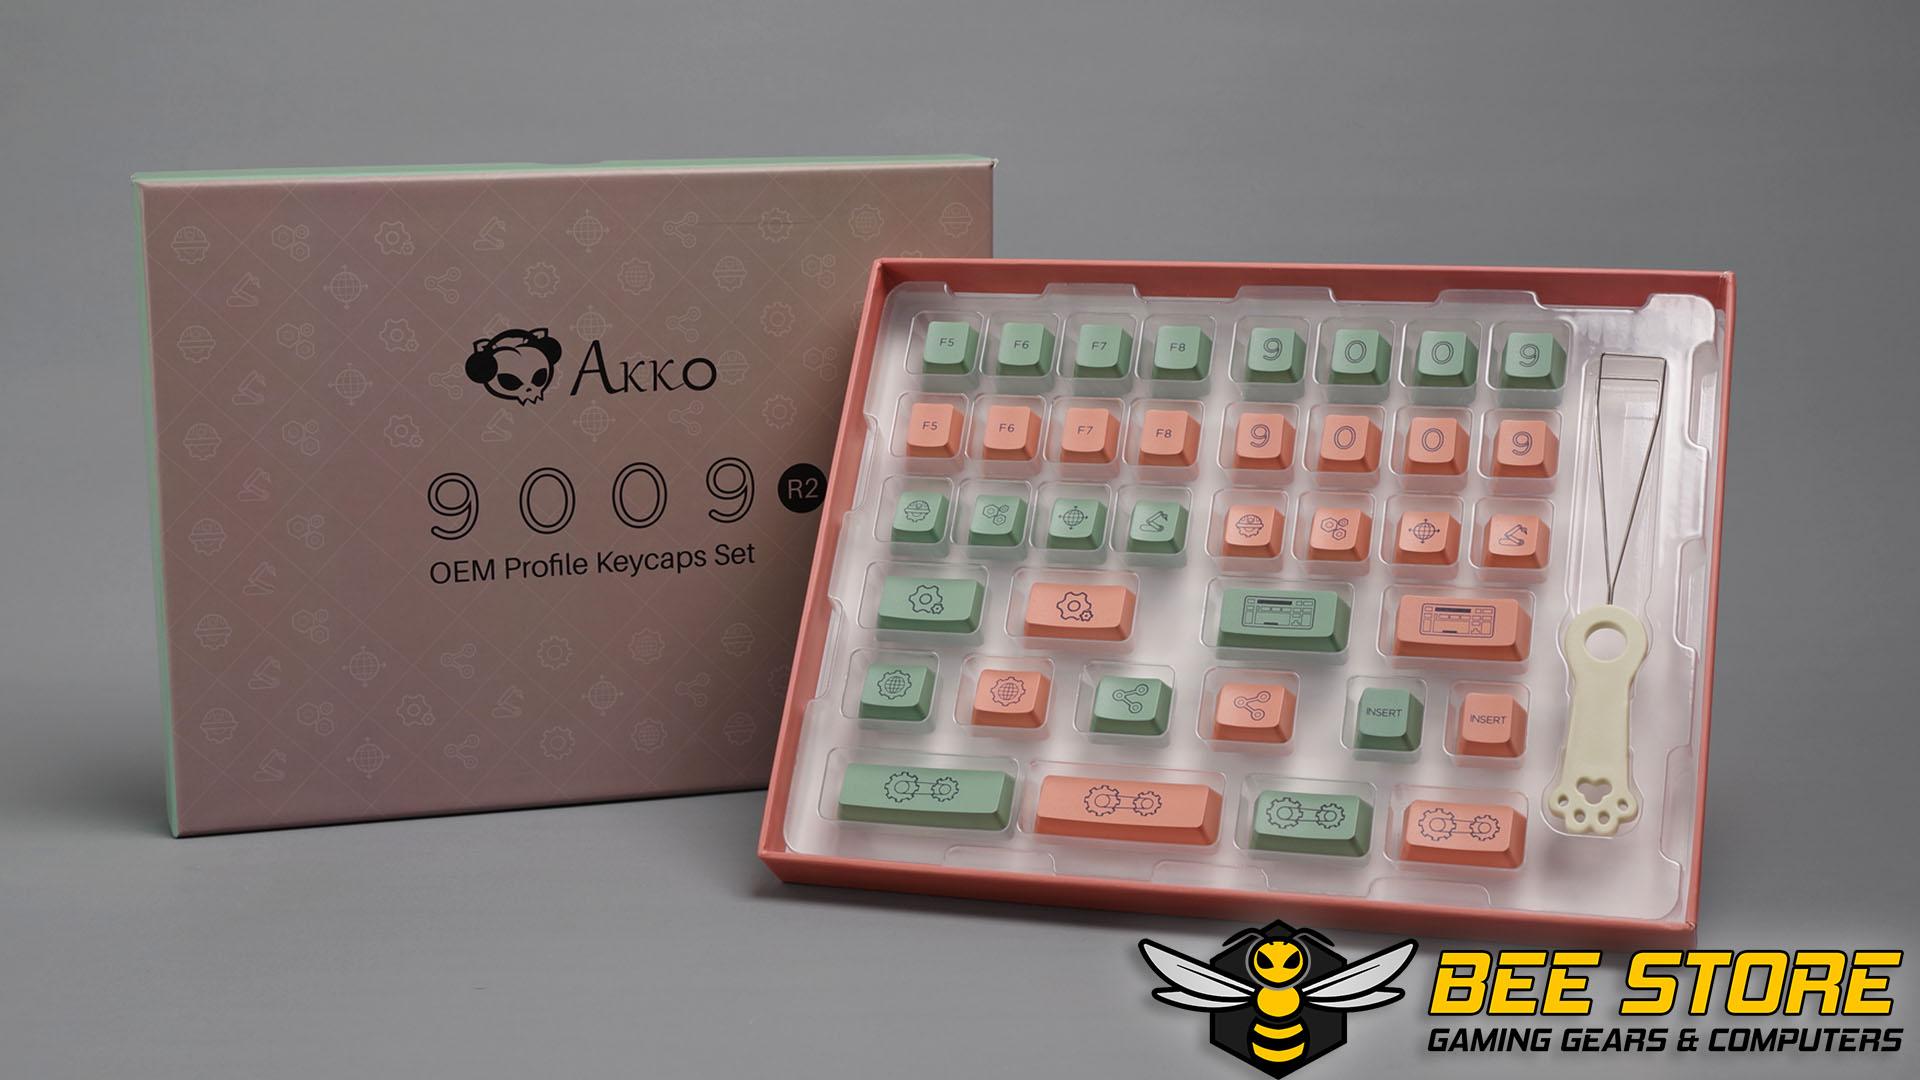 key-cap-akko-9009-retro-r2-beegaming-03